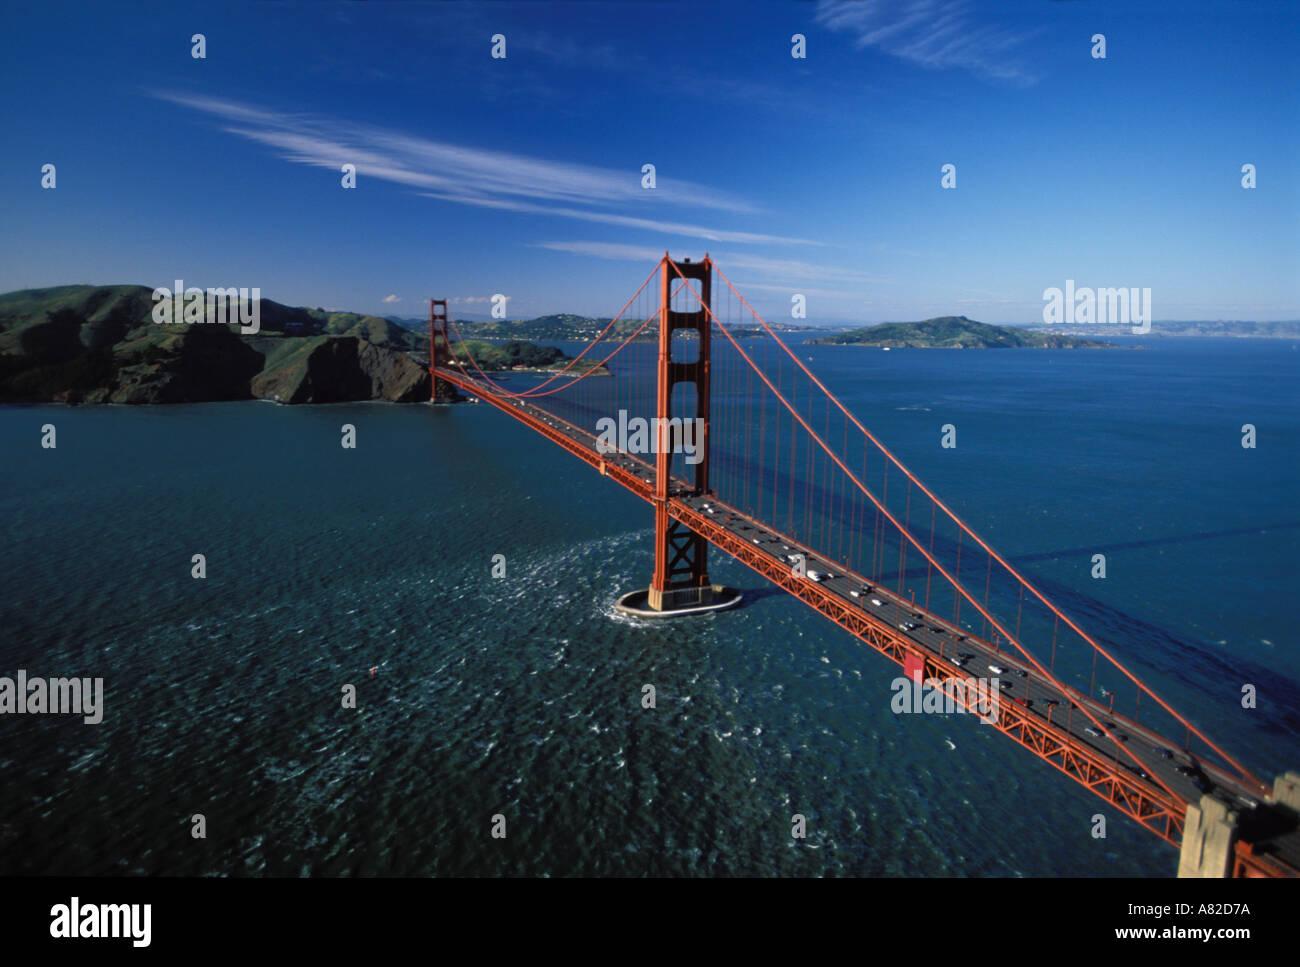 California, San Francisco Bay, Aerial view of Golden Gate Bridge Stock Photo